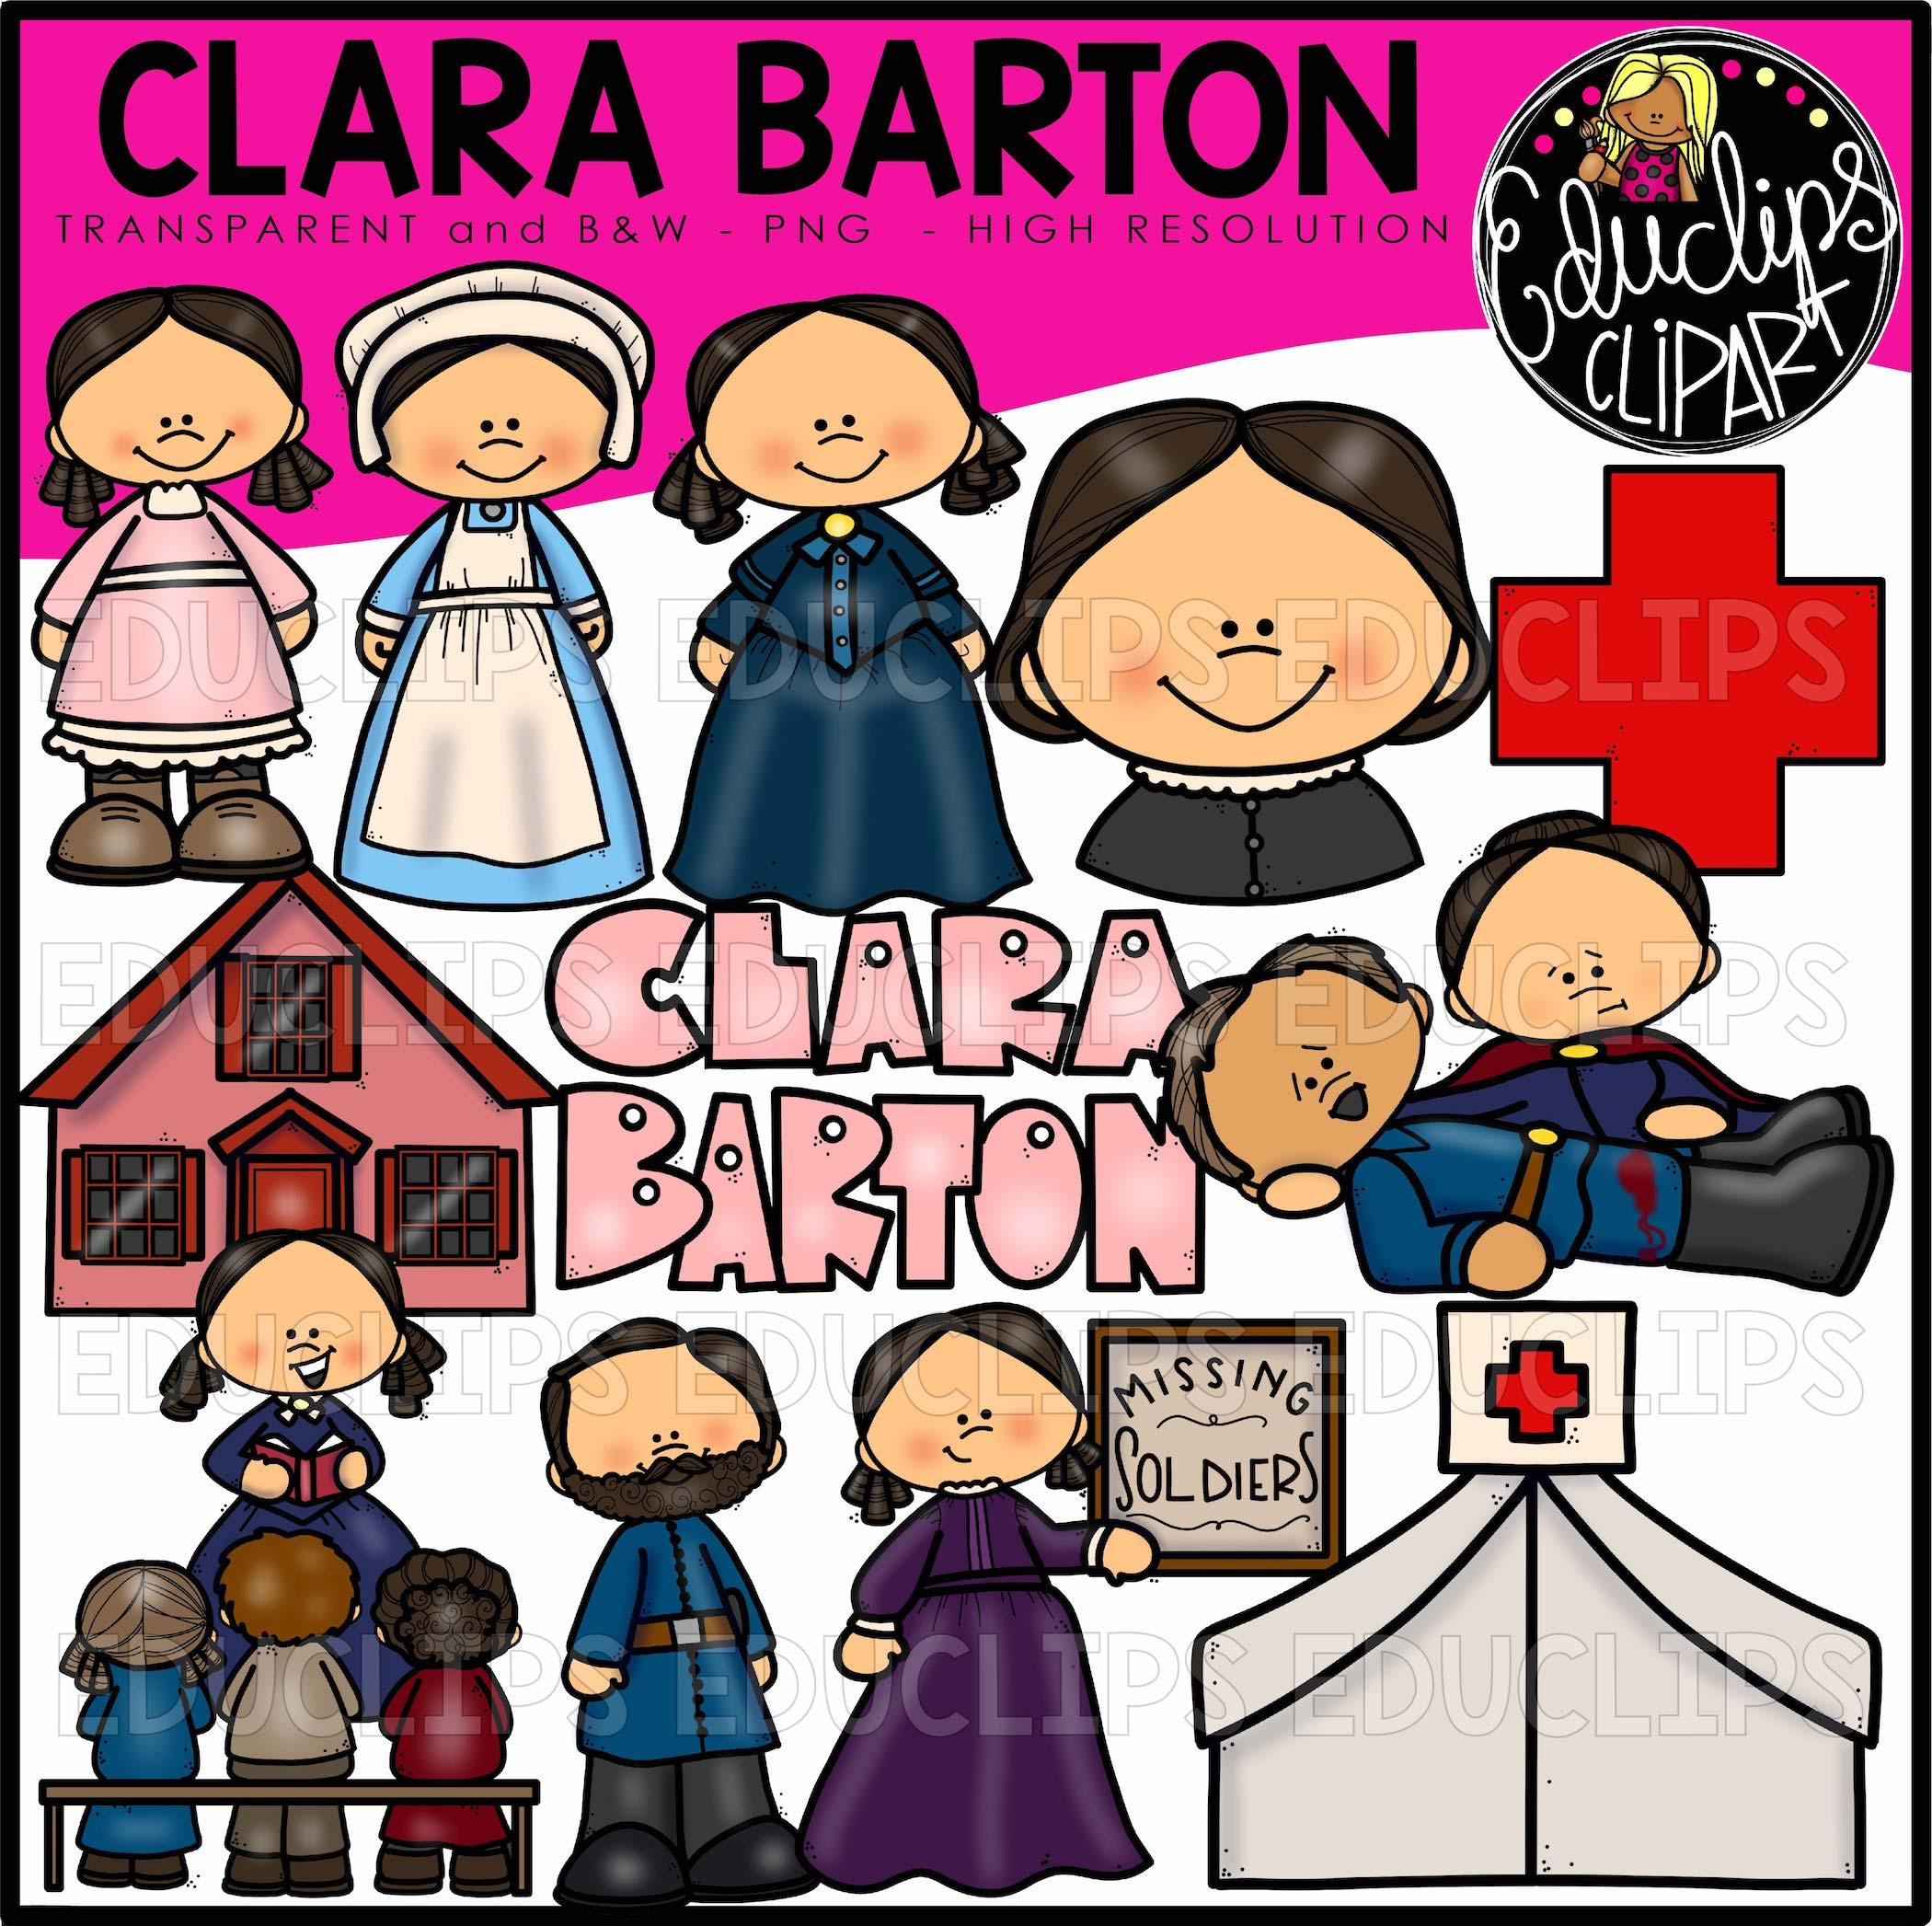 Atractivo Colorear Clara Barton Molde - Dibujos Para Colorear En ...